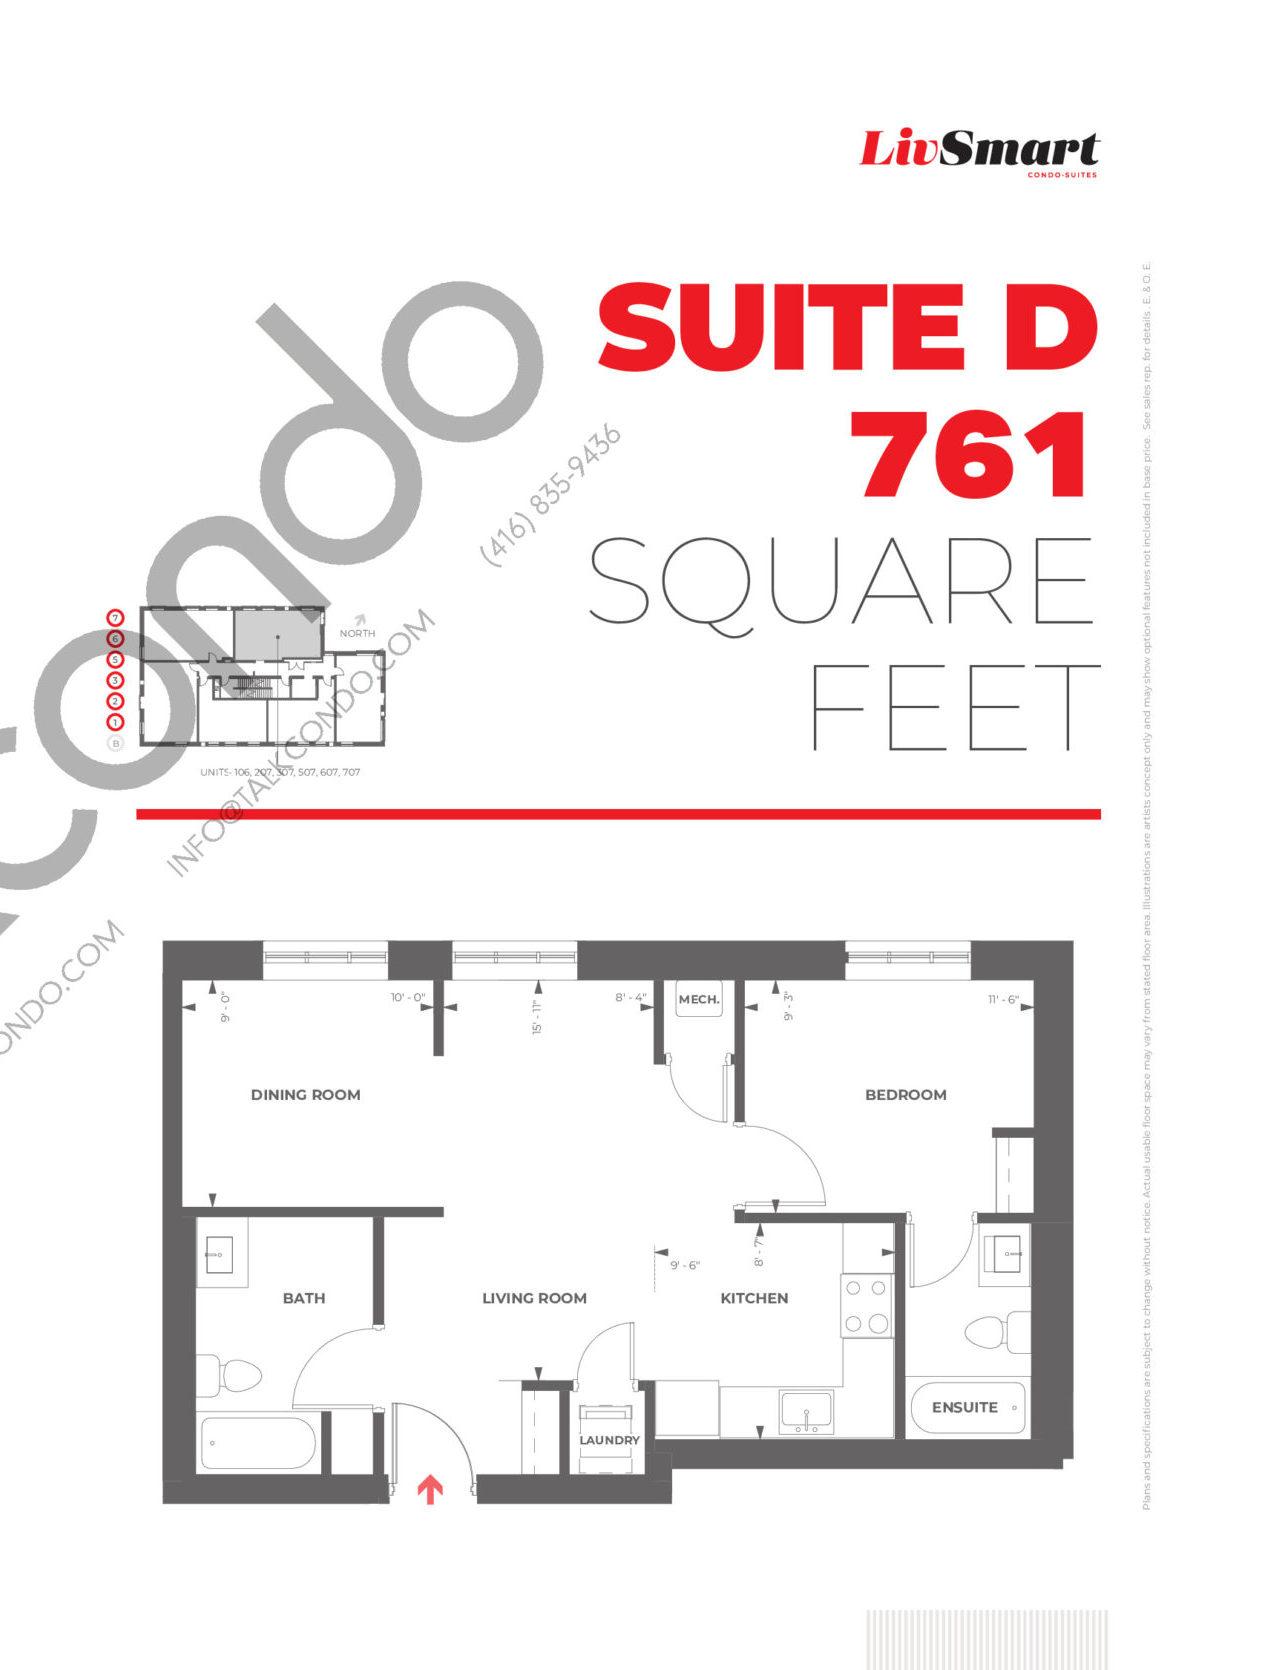 Suite D Floor Plan at LivSmart Condos - 761 sq.ft